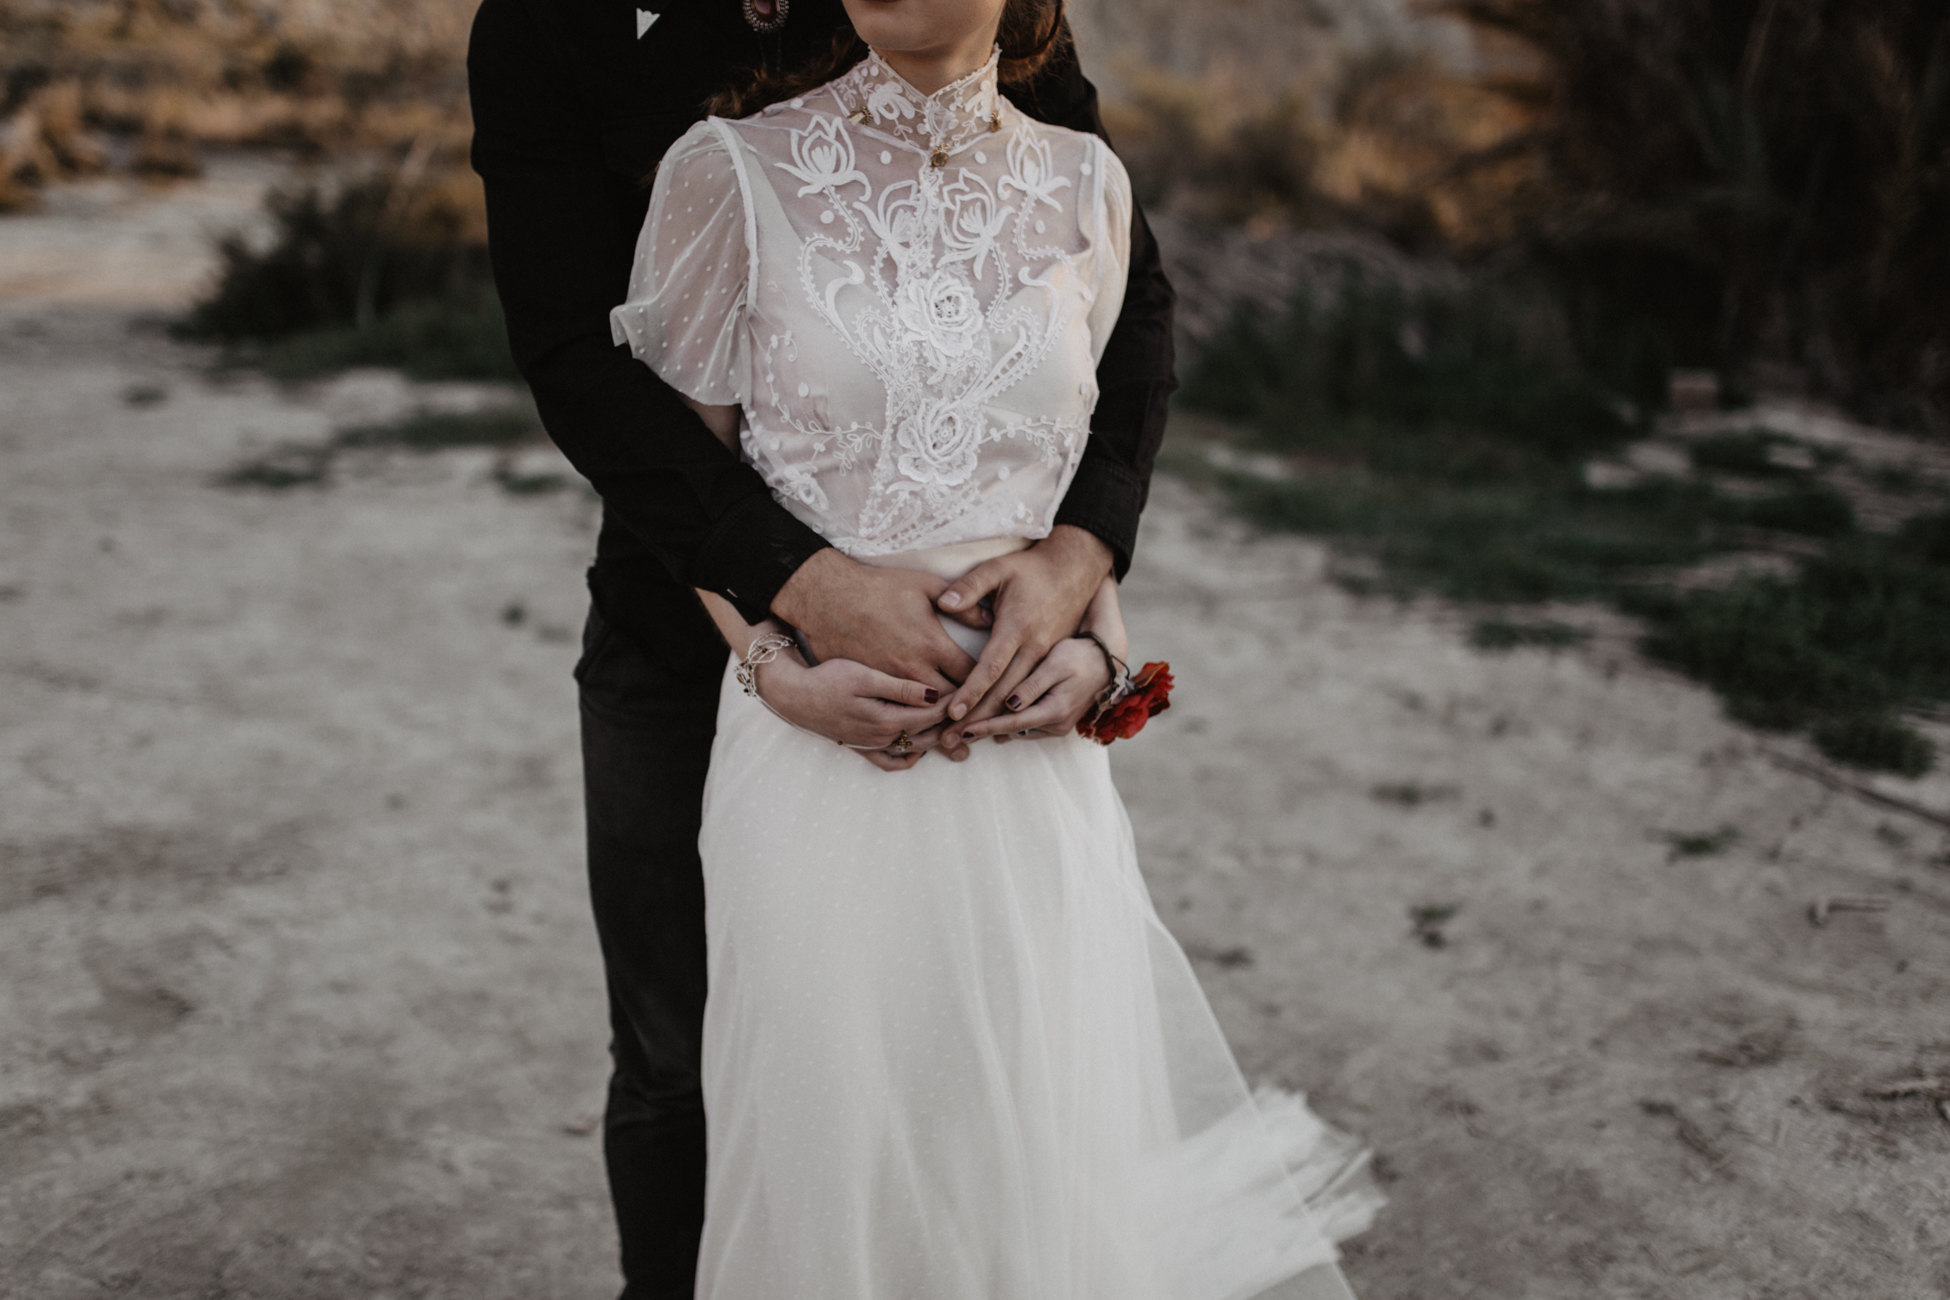 thenortherngirlphotography_photography_thenortherngirl_rebeccascabros_wedding_weddingphotography_weddingphotographer_wood_muebles_deco_bodasdecaramelo_home_bedtime_gaywedding_editorial_desierto_desert_wildestdreams_amortexano-313.jpg